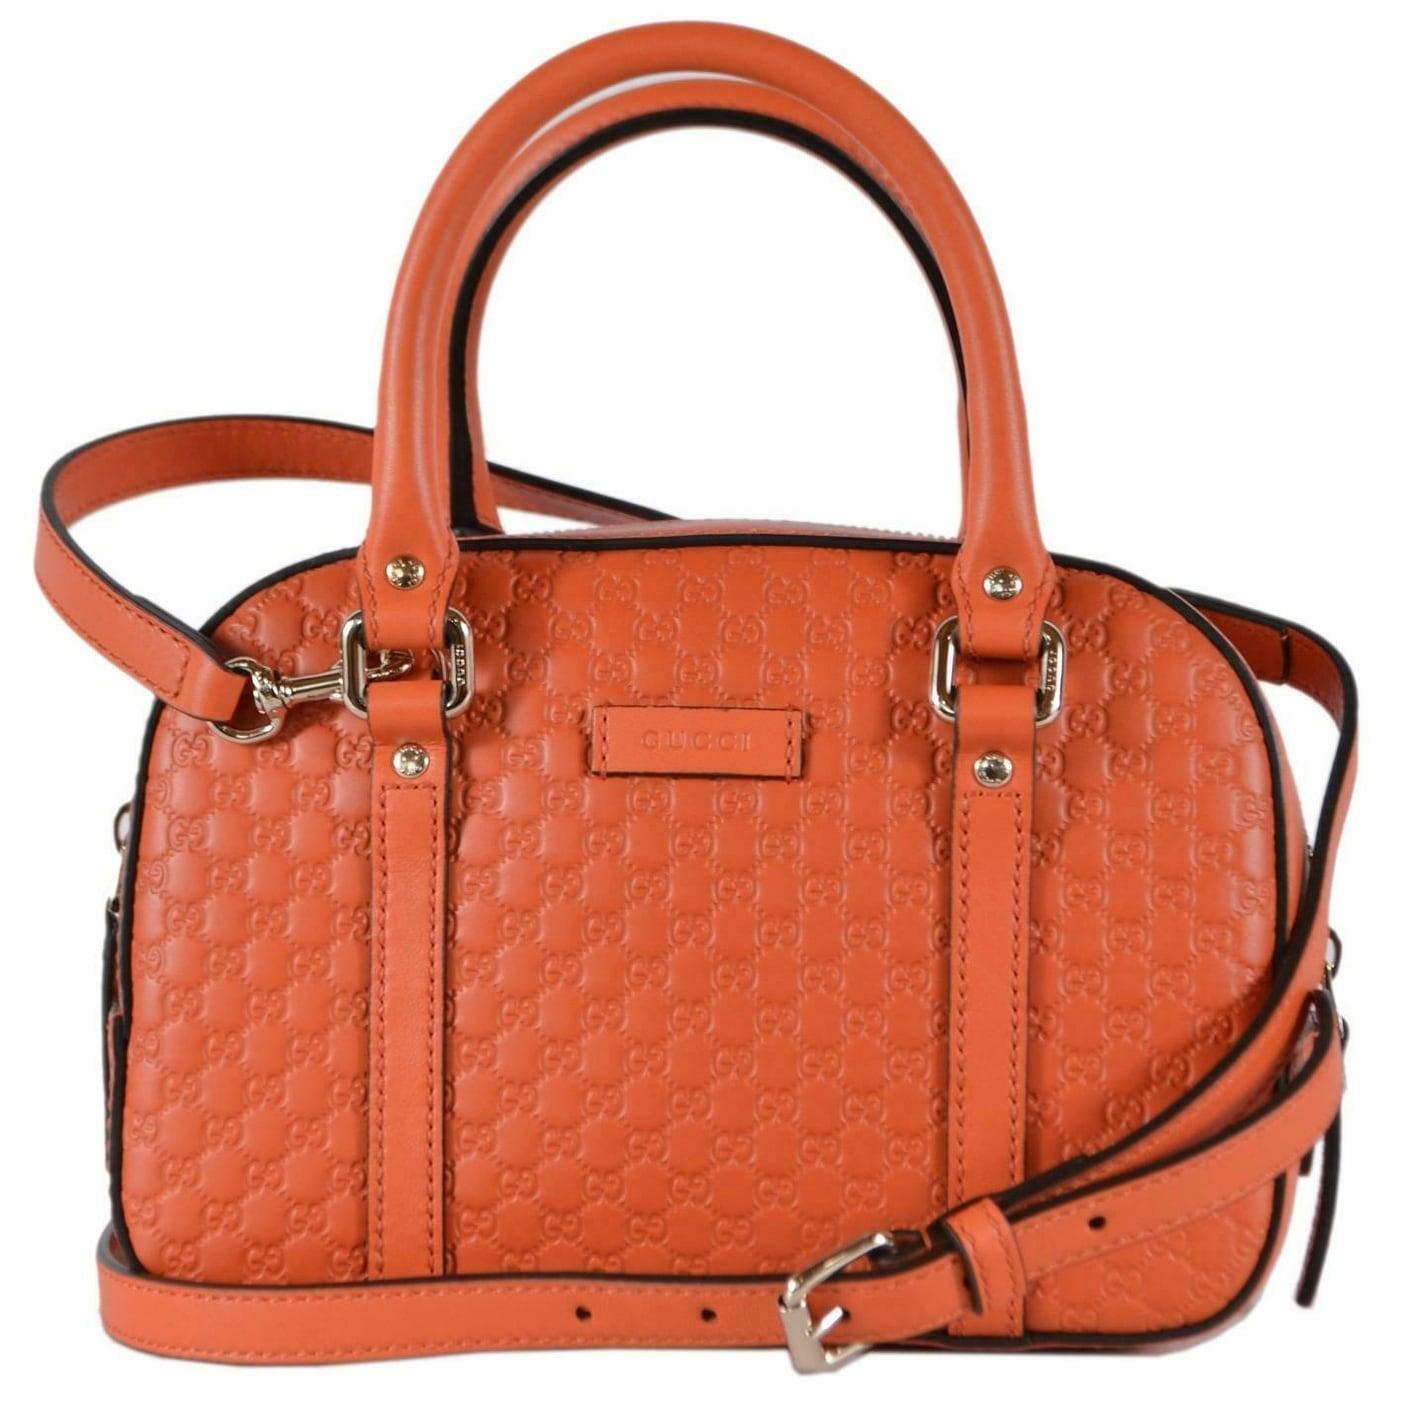 972b692748 Cross-body Designer Handbags | Find Great Designer Store Deals Shopping at  Overstock